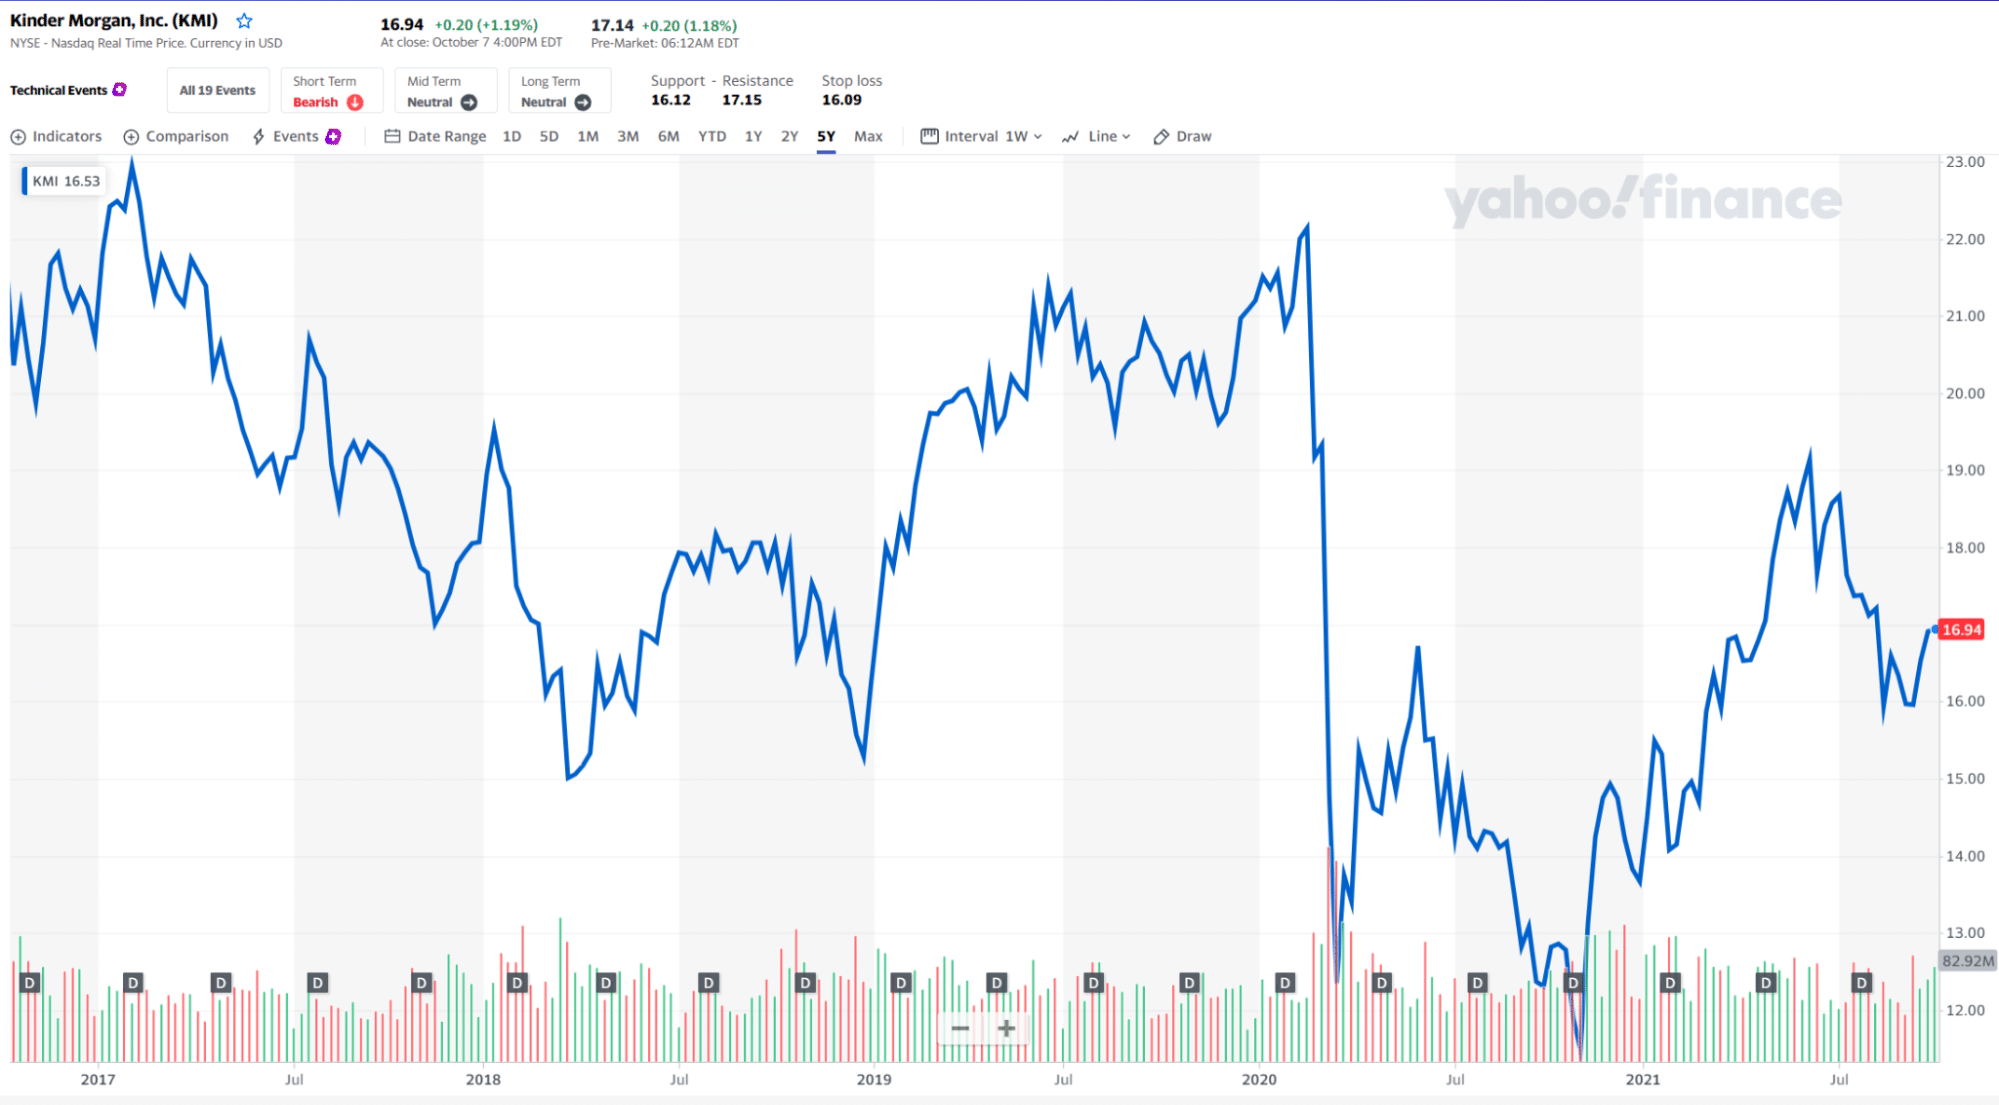 KMI price chart